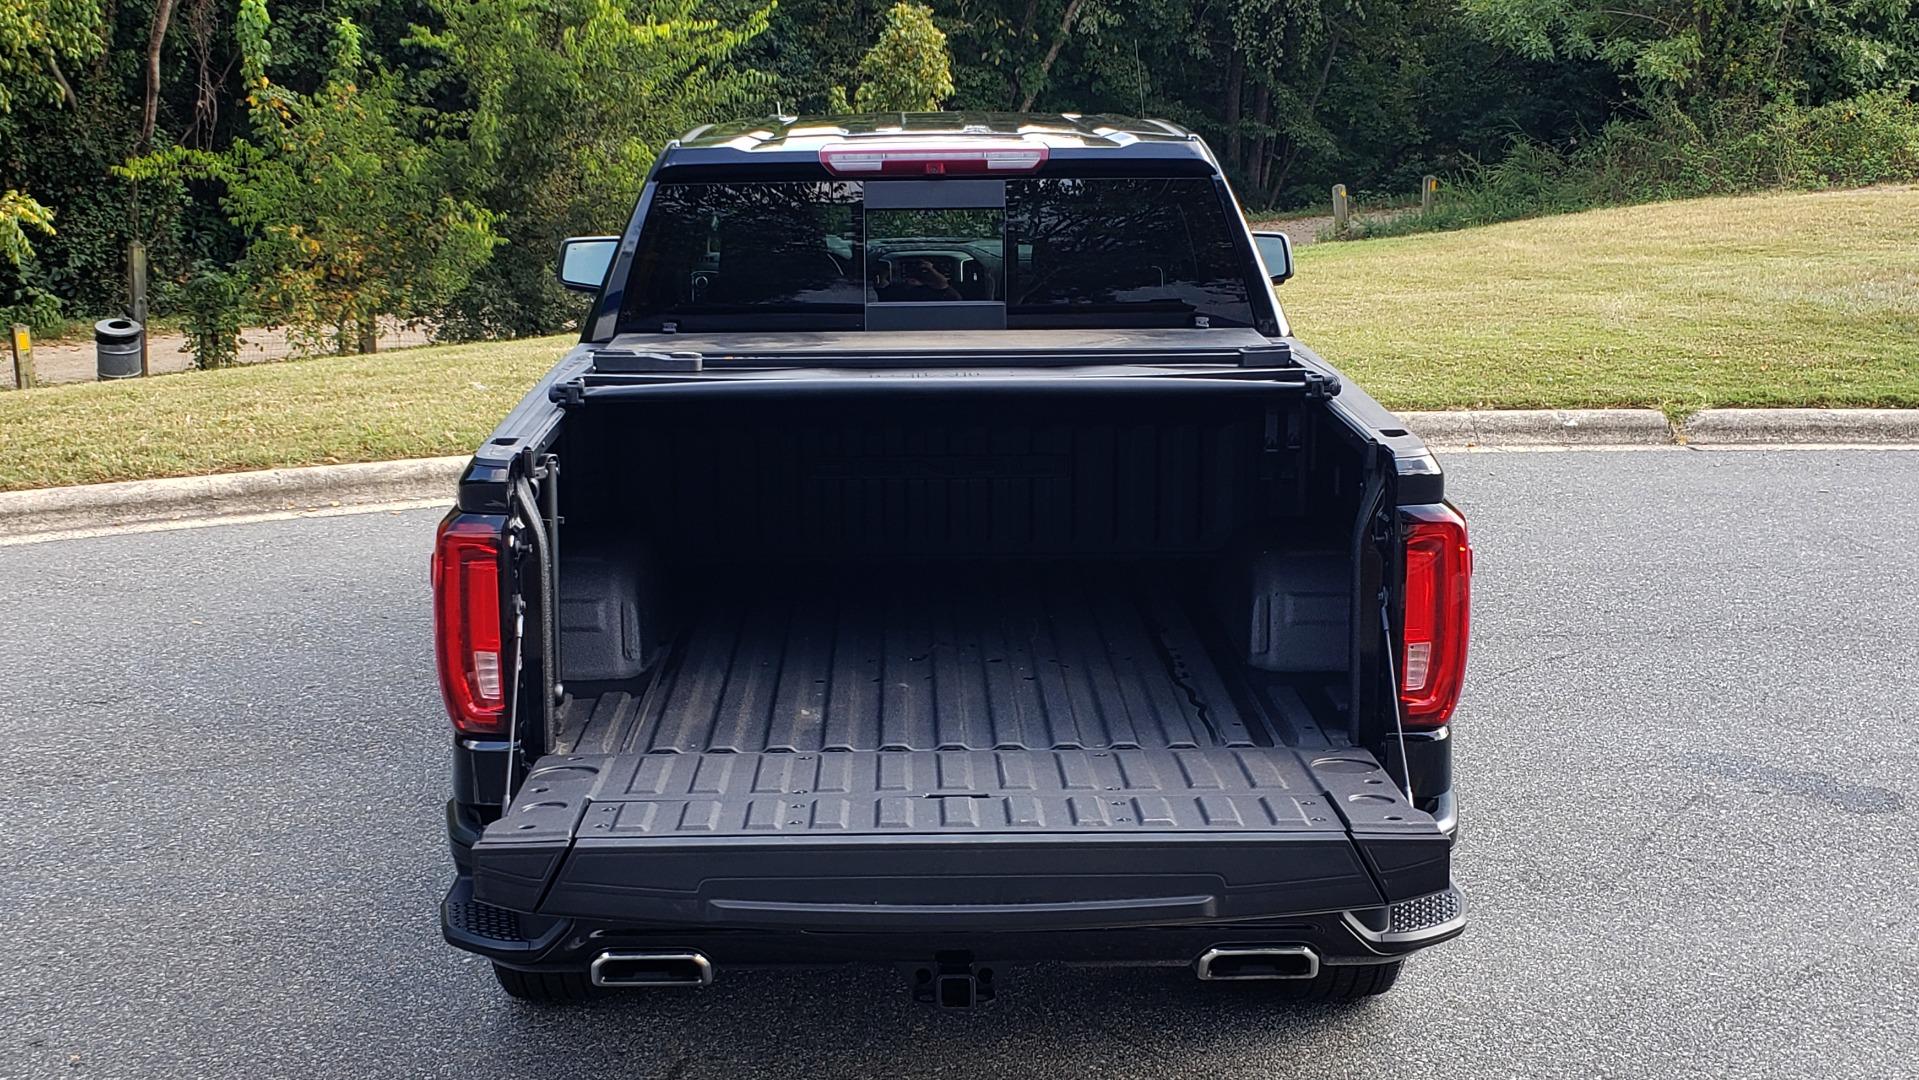 Used 2019 GMC SIERRA 1500 DENALI ULTIMATE 4WD / NAV / TECH PKG / DRVR ALRT for sale Sold at Formula Imports in Charlotte NC 28227 20